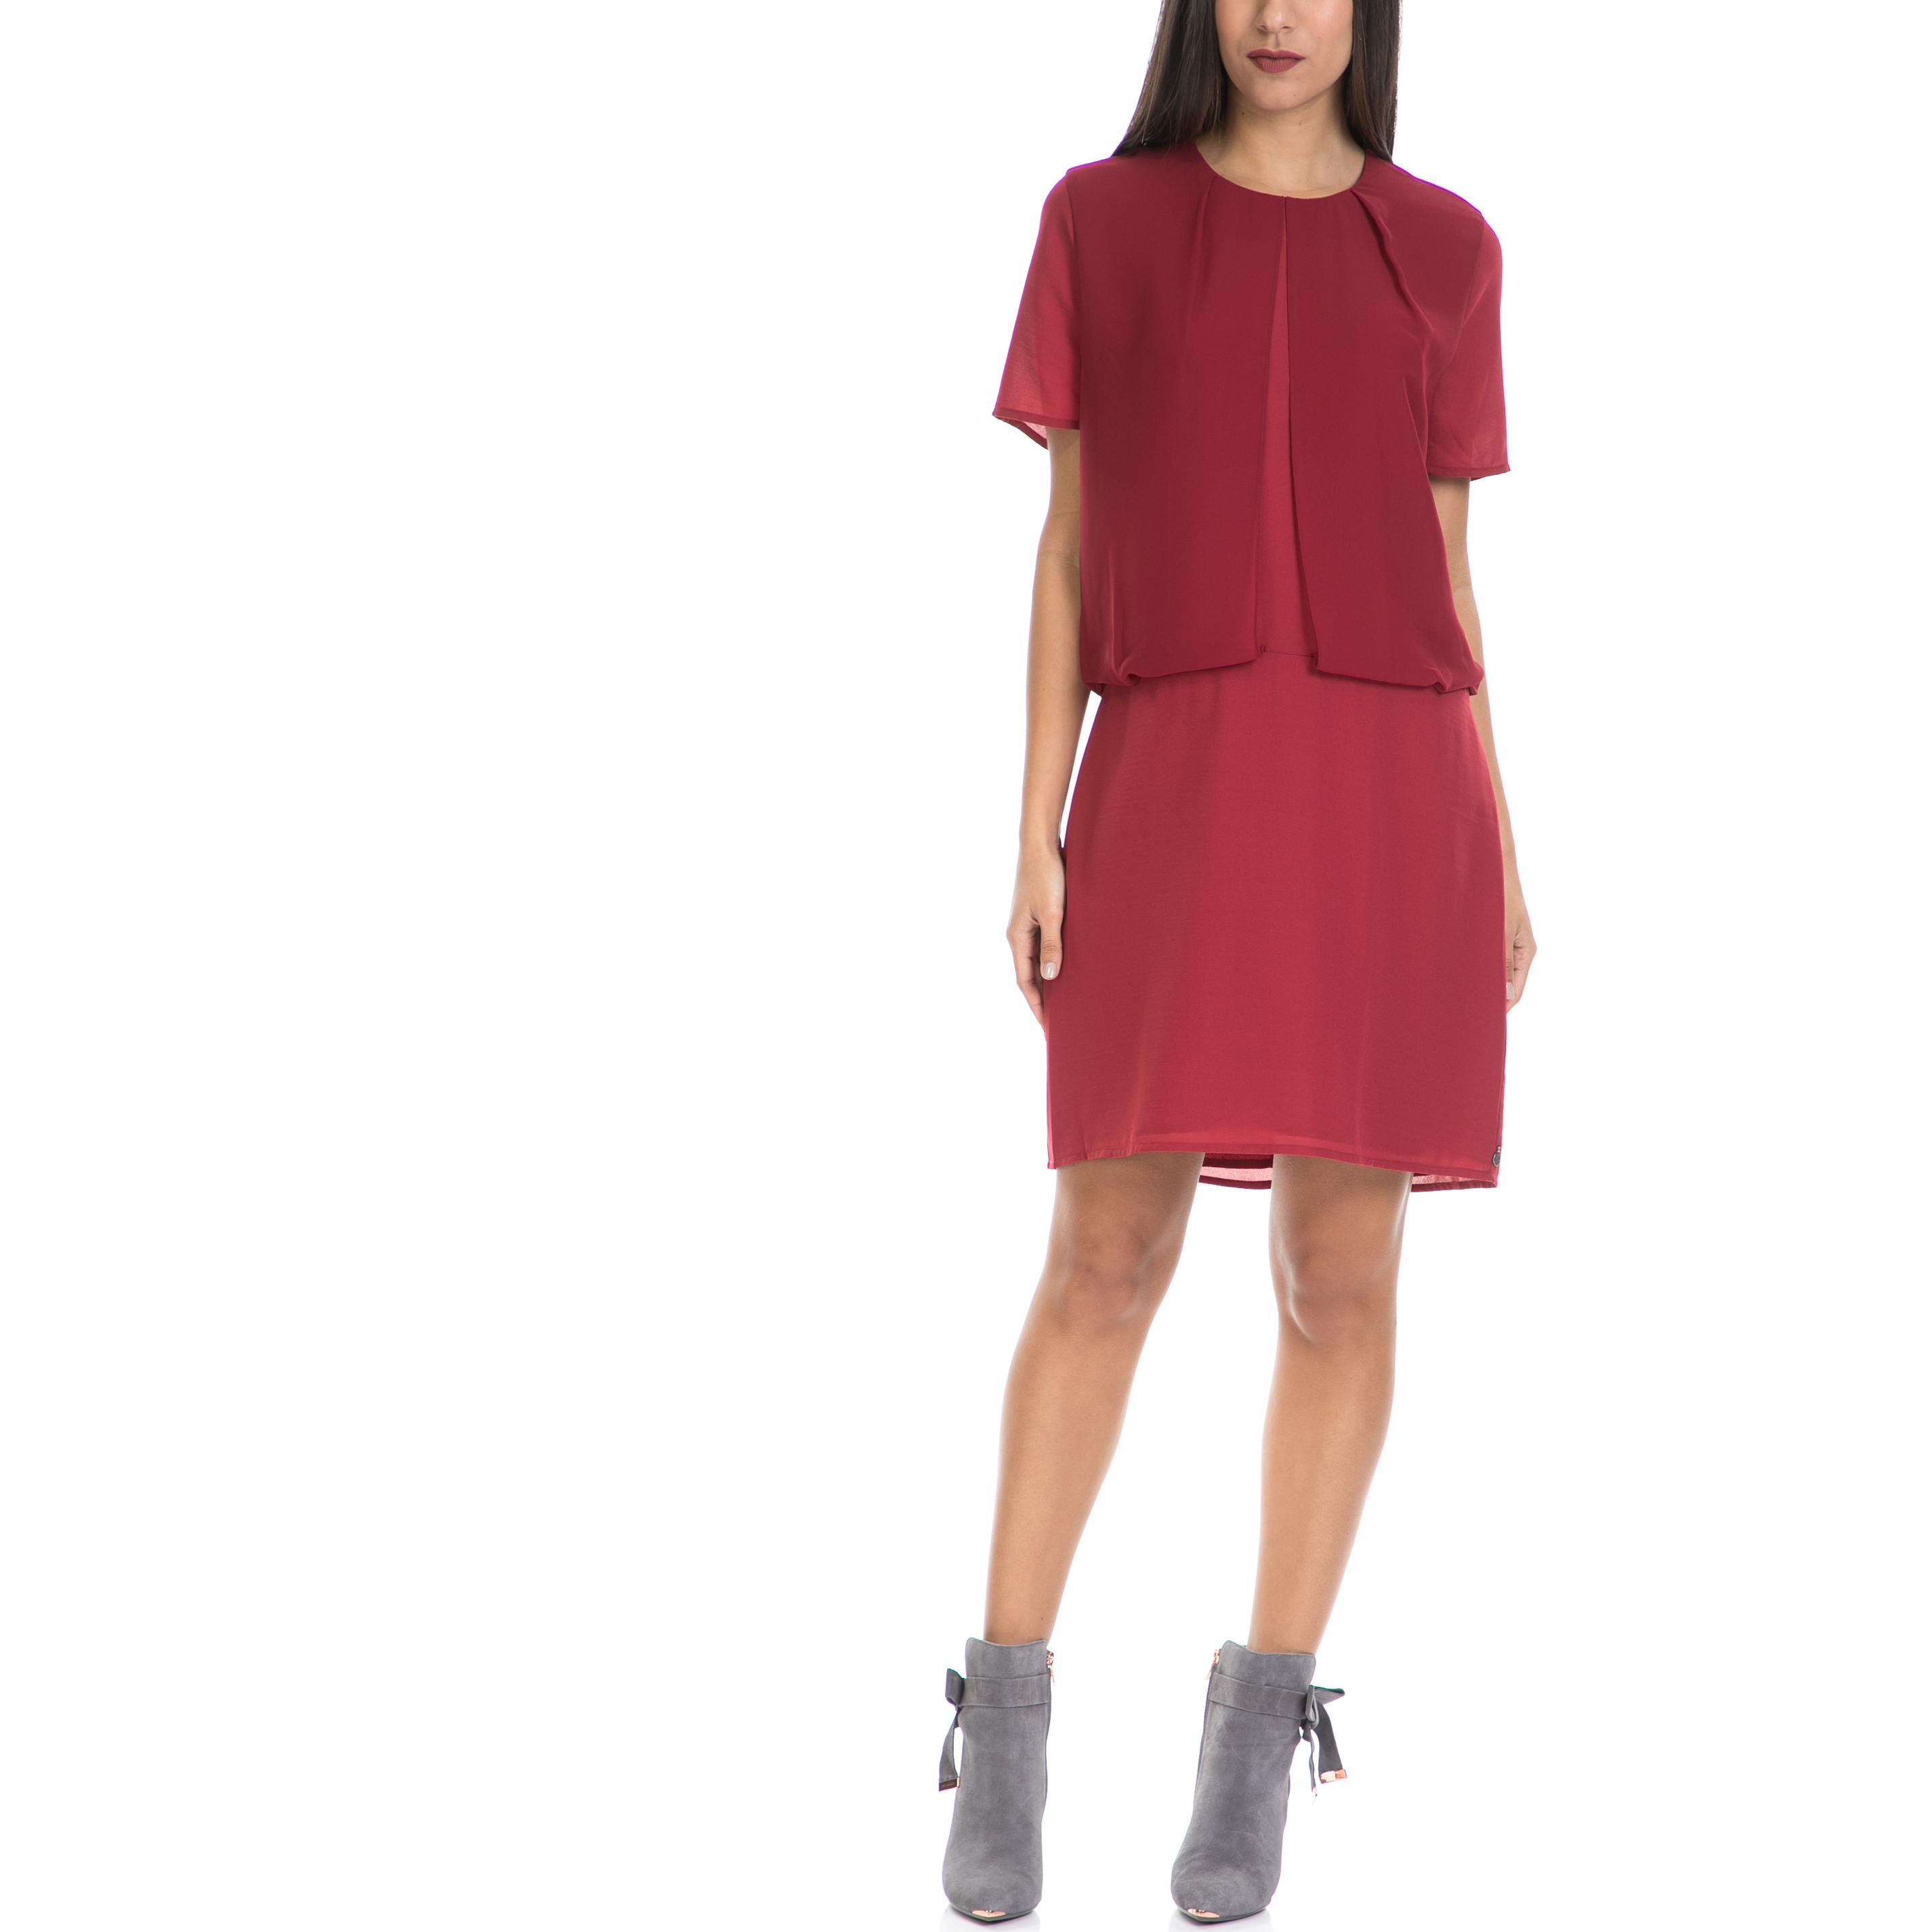 MAISON SCOTCH - Γυναικείο φόρεμα MAISON SCOTCH κόκκινο γυναικεία ρούχα φορέματα μίνι